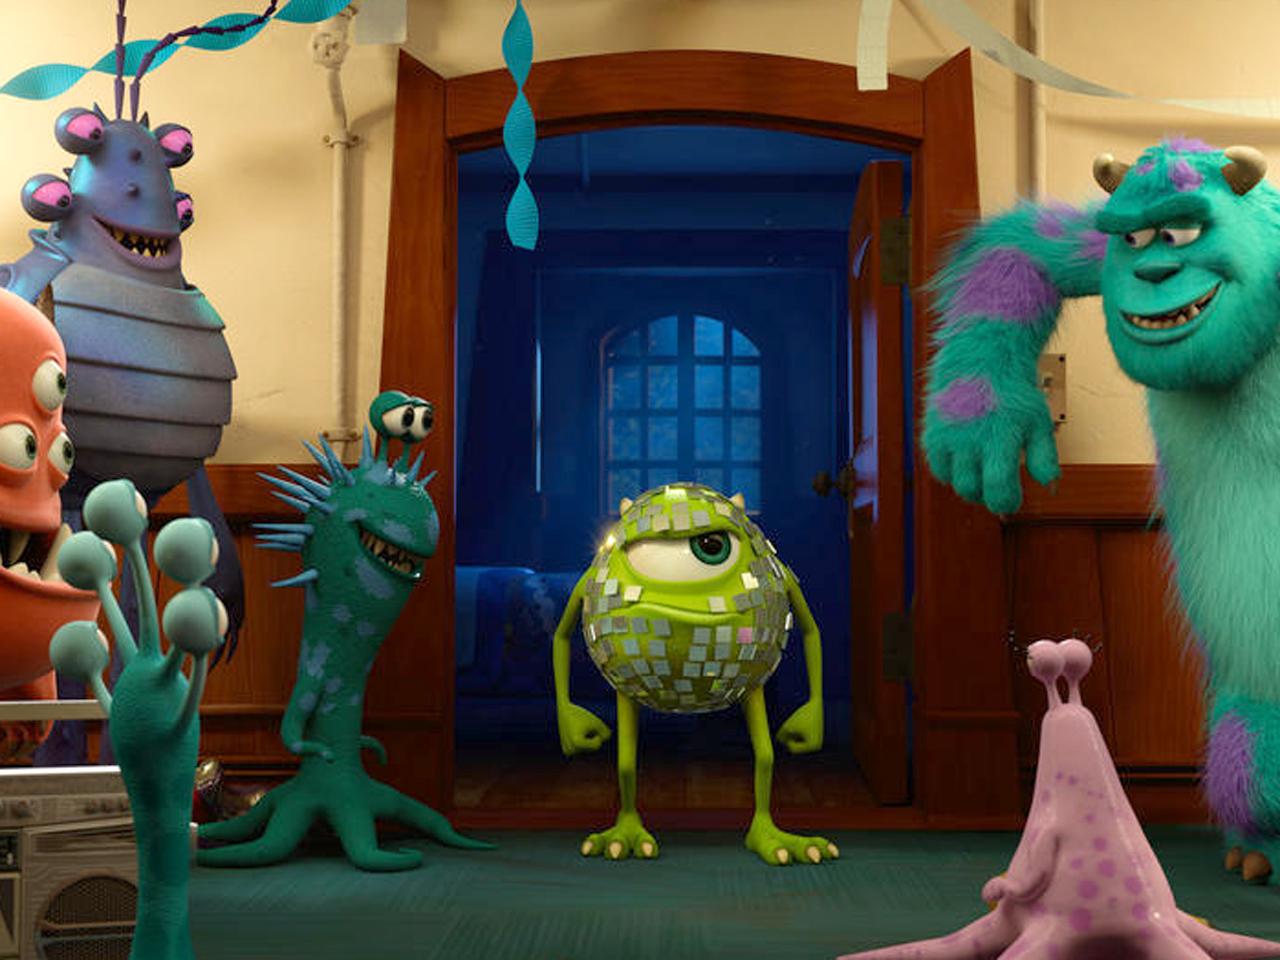 'Monsters University' scares up $82 million, overcomes zombie hordes